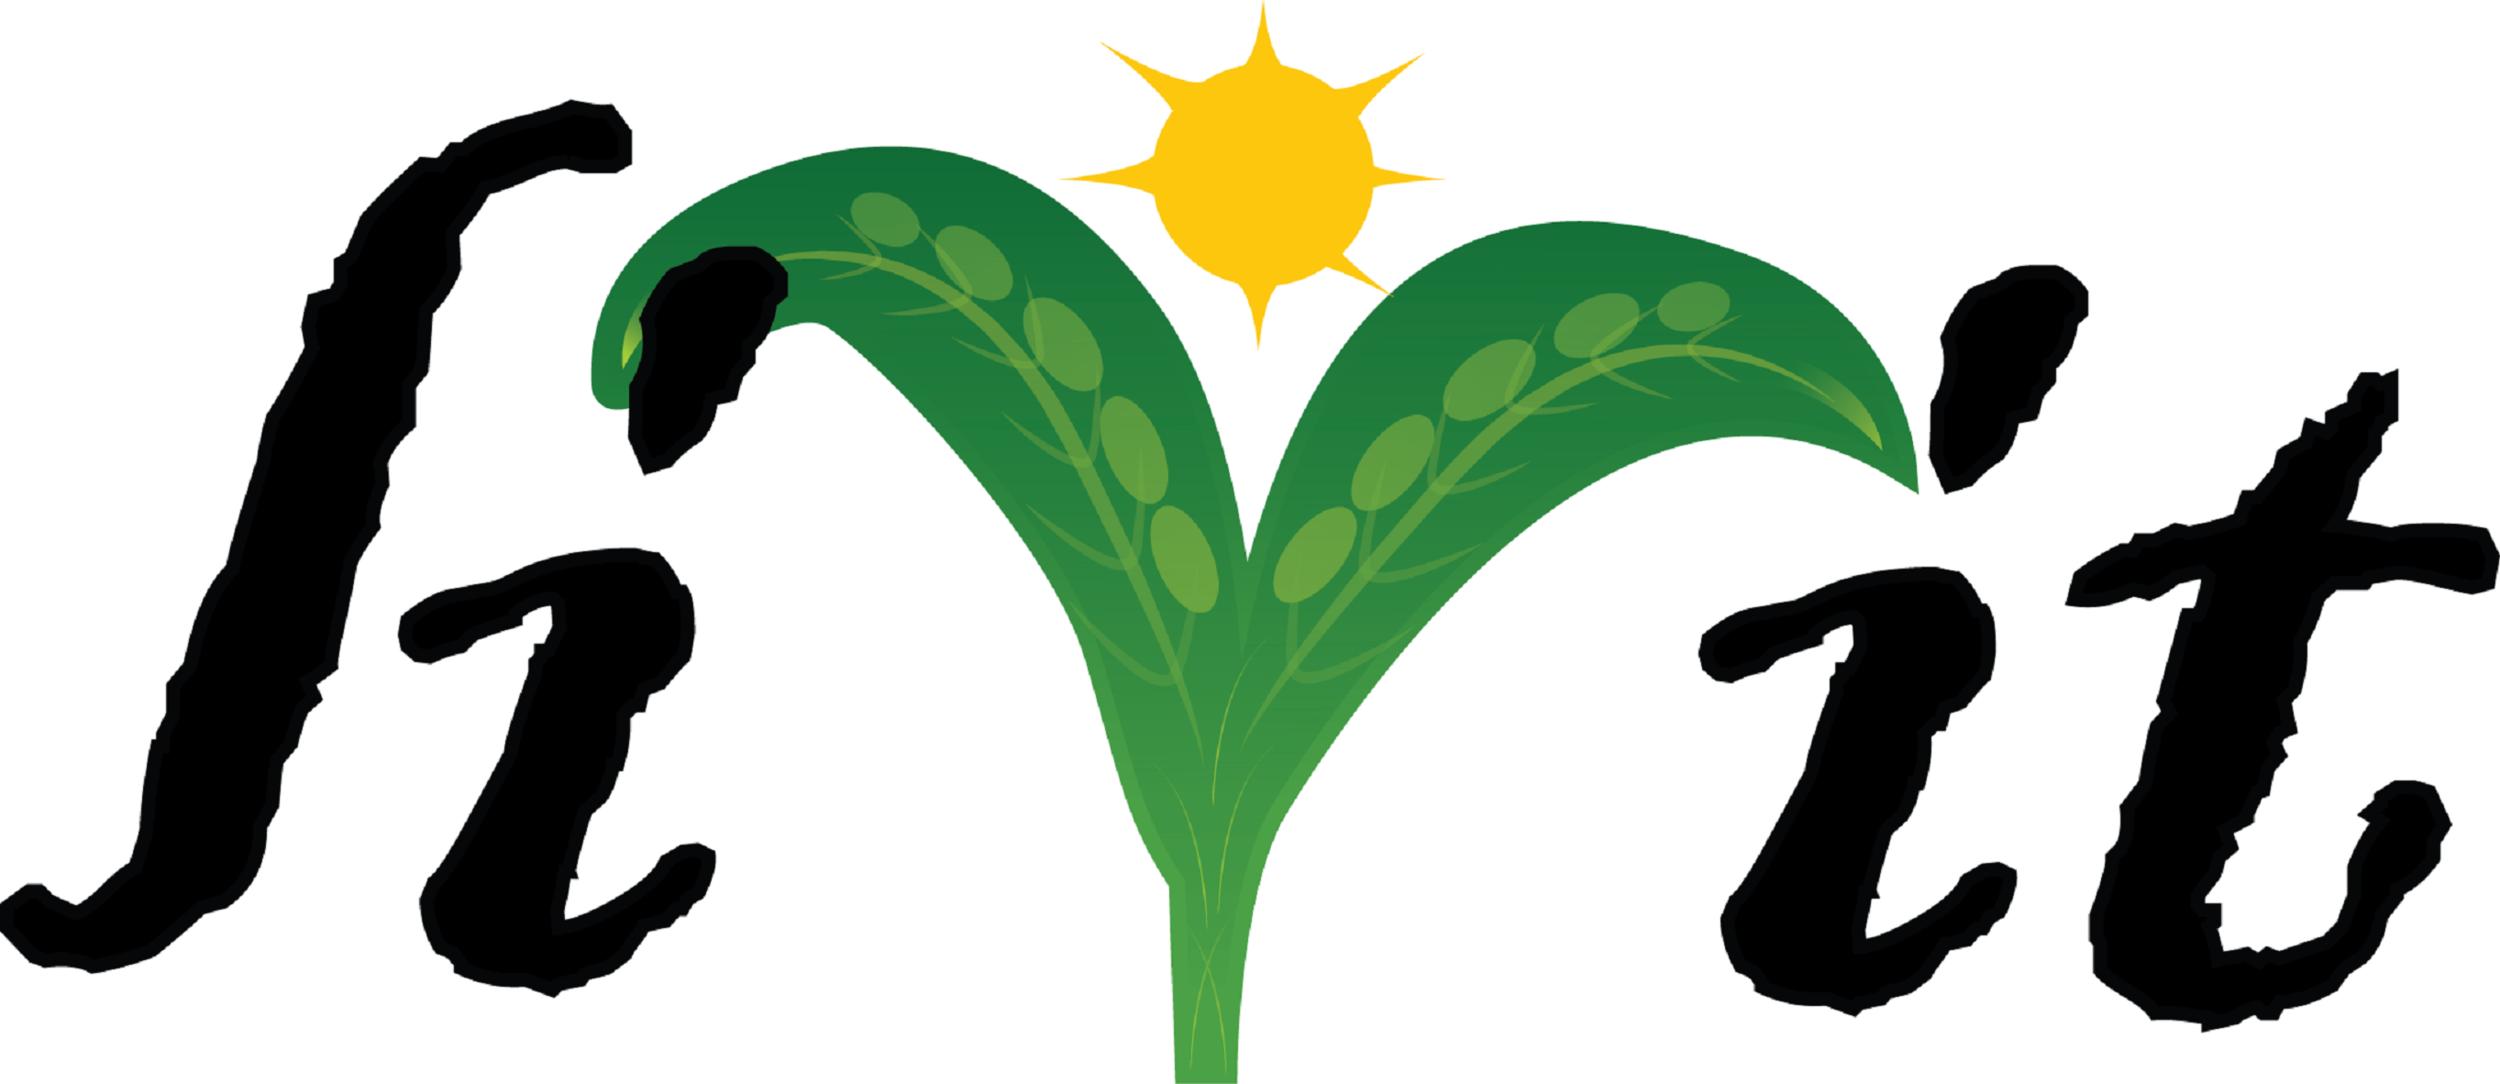 Livit logo larger size.png